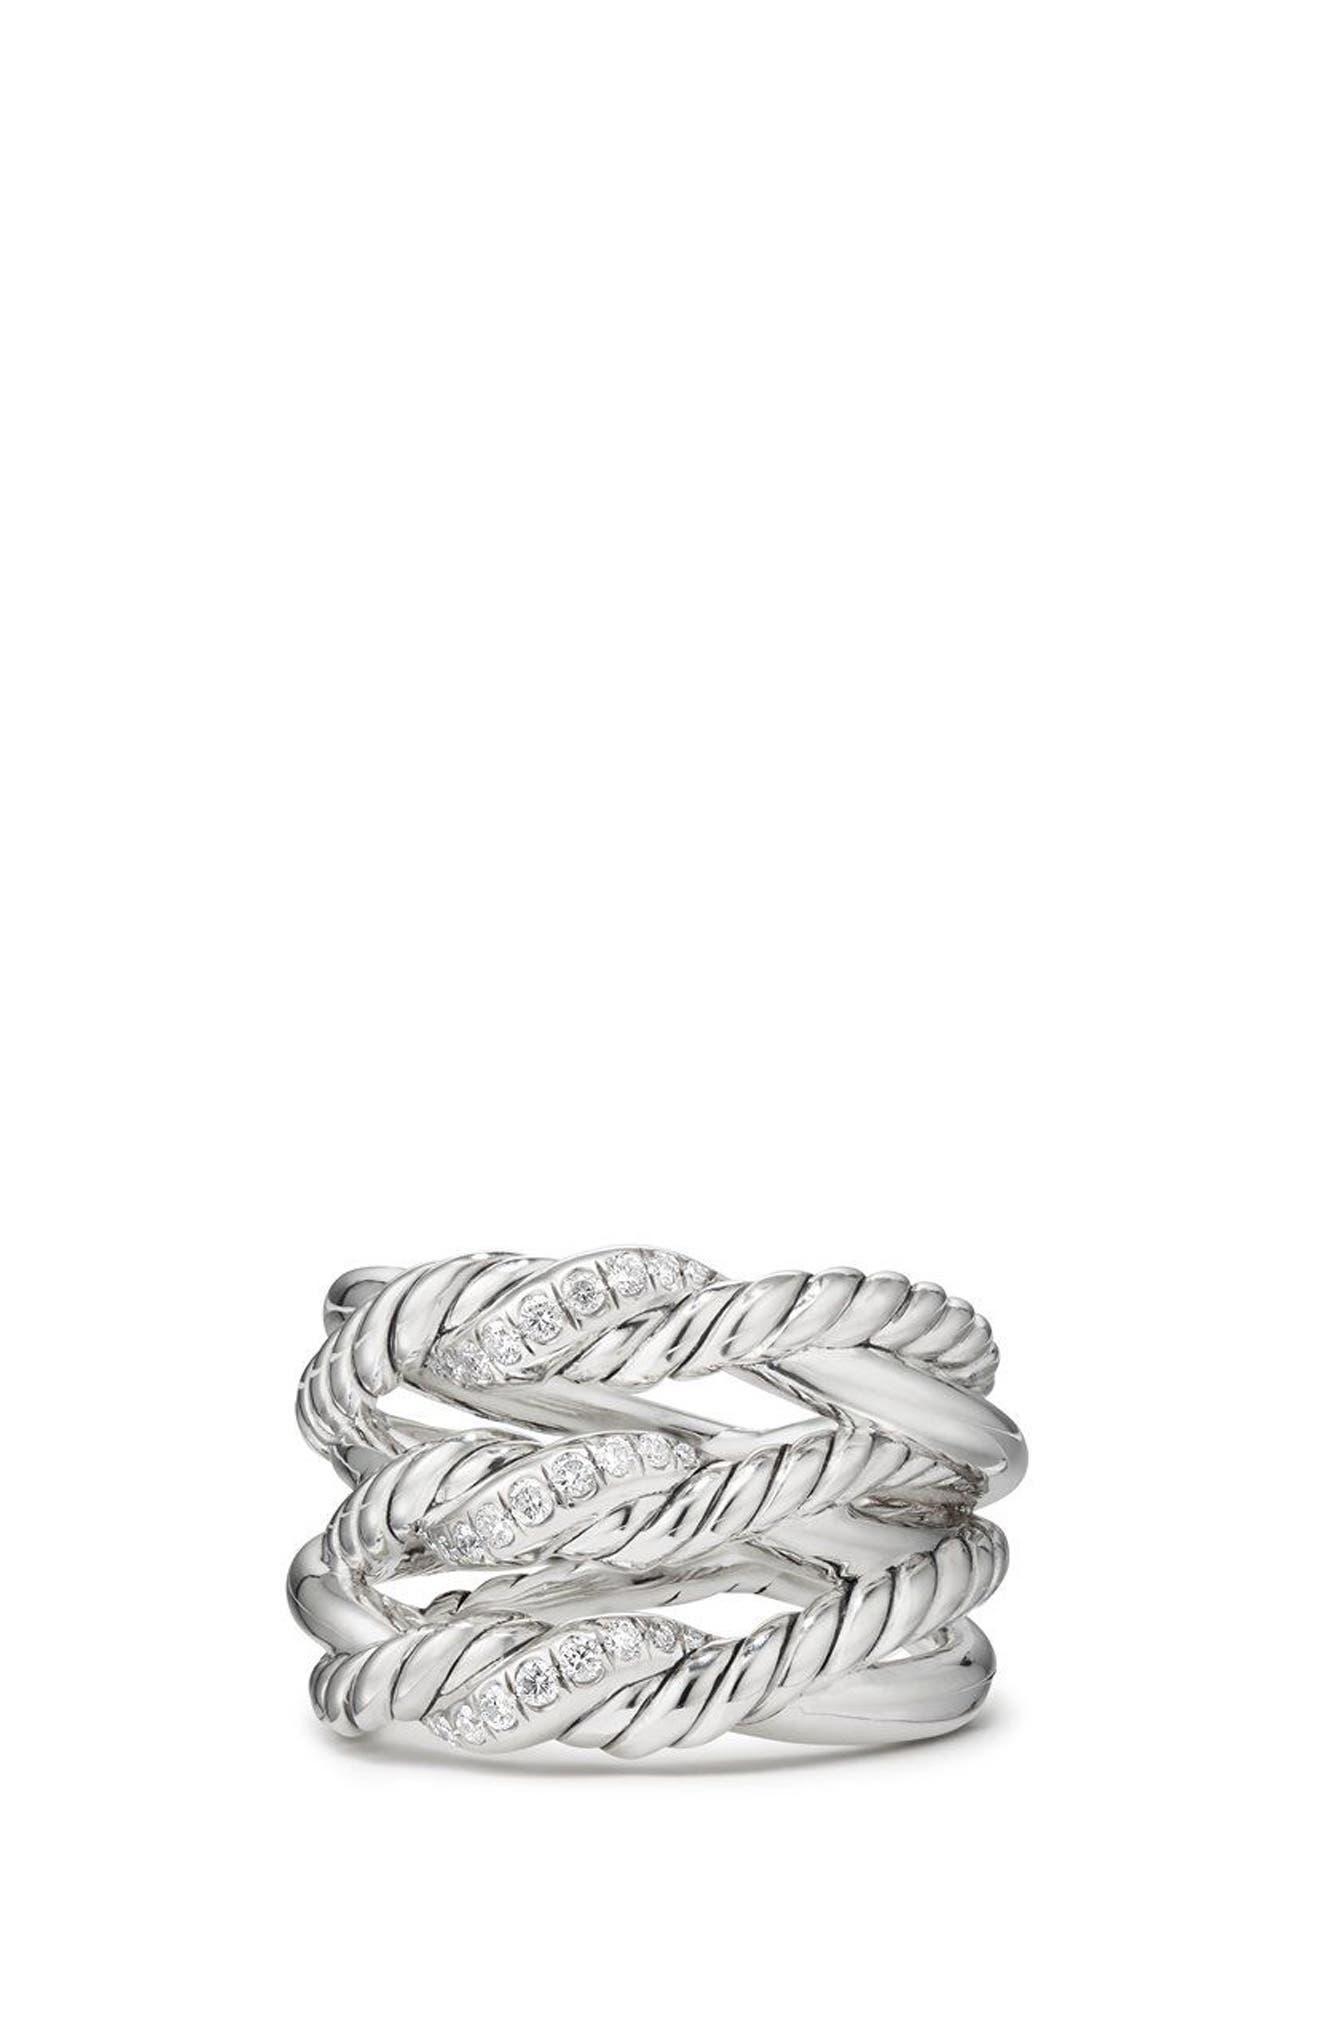 David Yurman Continuance® 3-Row Ring with Diamonds